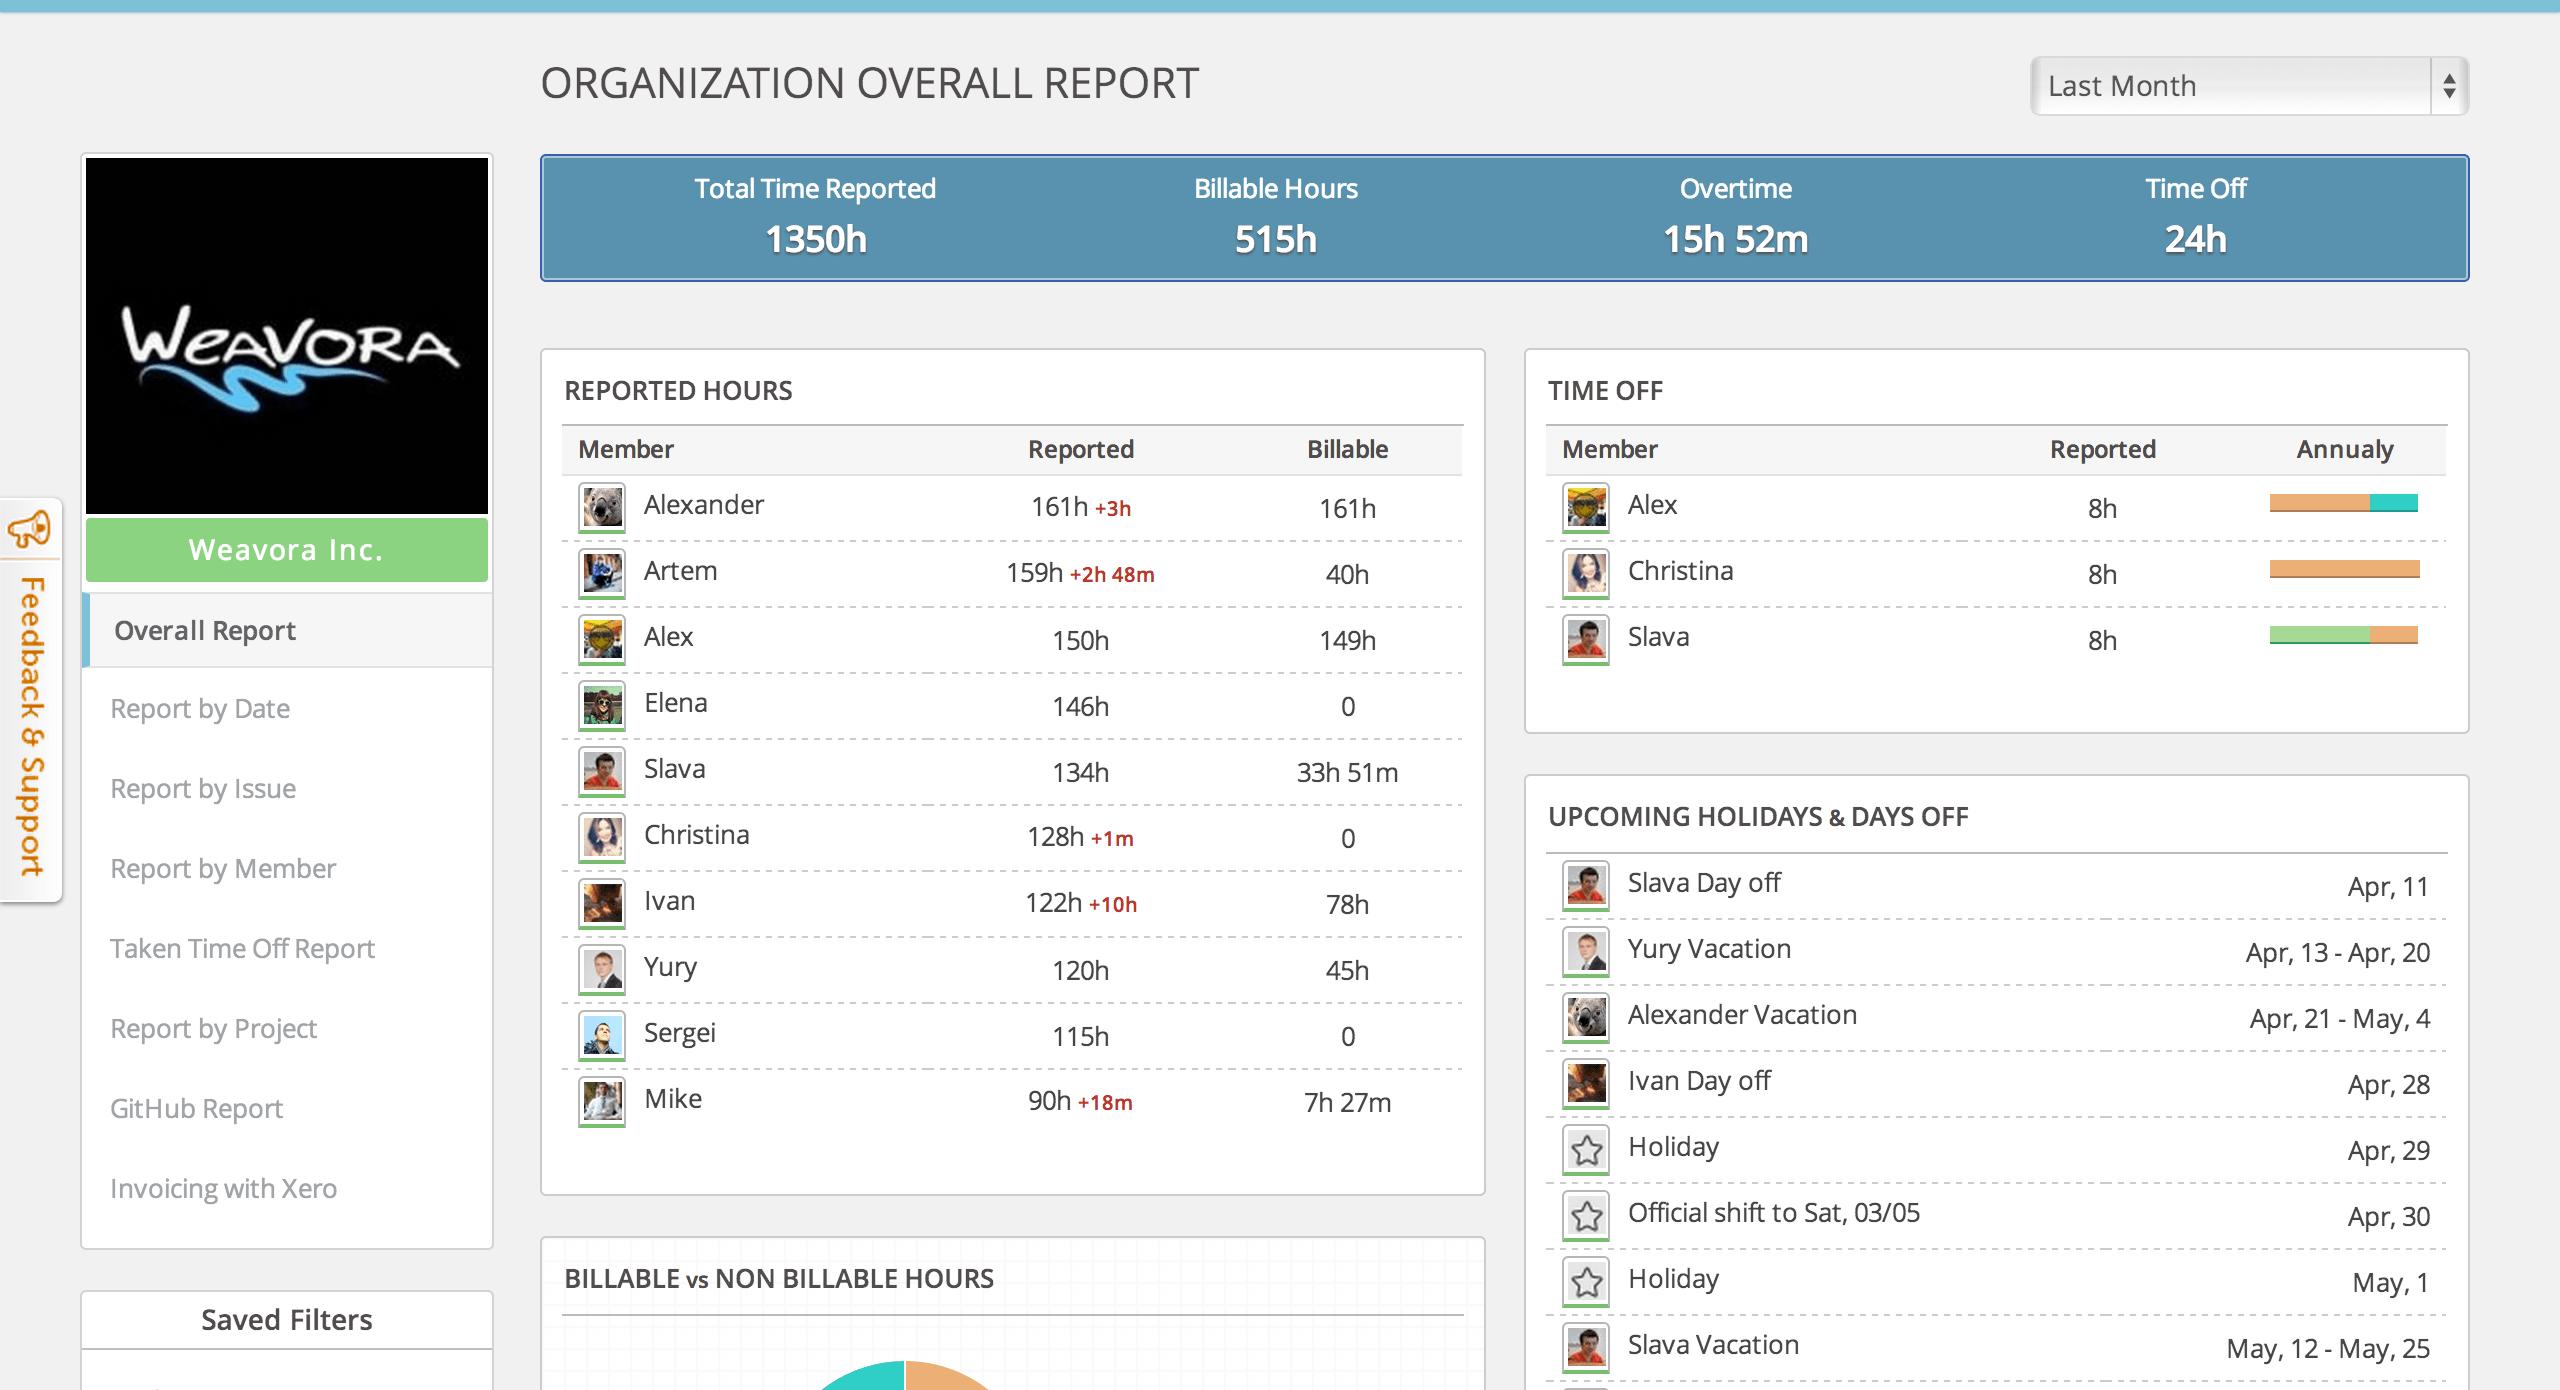 Everhour-Organization-Overall-Report